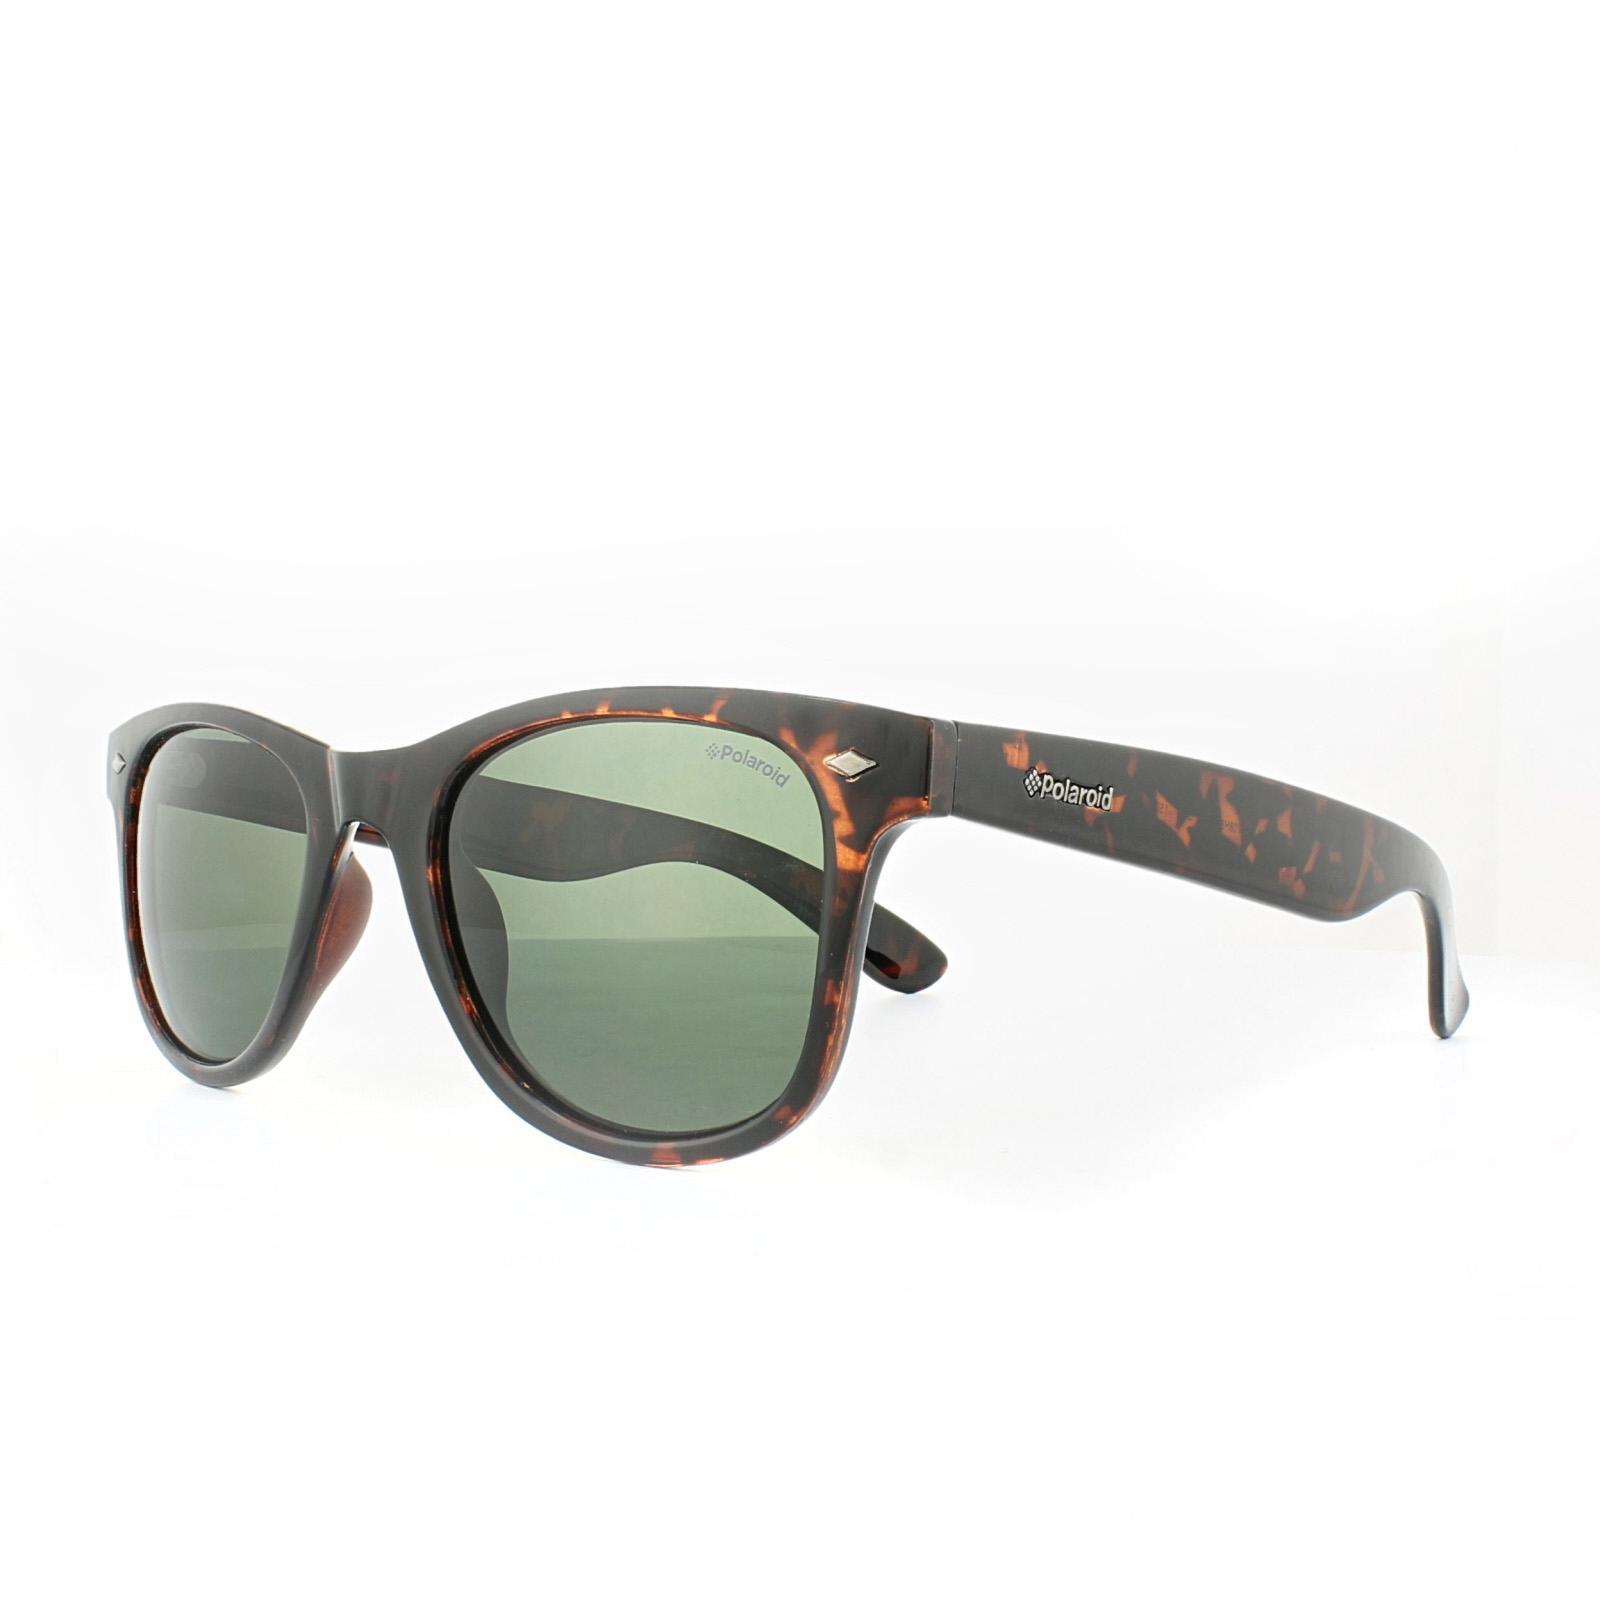 84ec3eab51f7 Sentinel Polaroid Sunglasses PLD 1016 S V08 H8 Havana Green Polarized